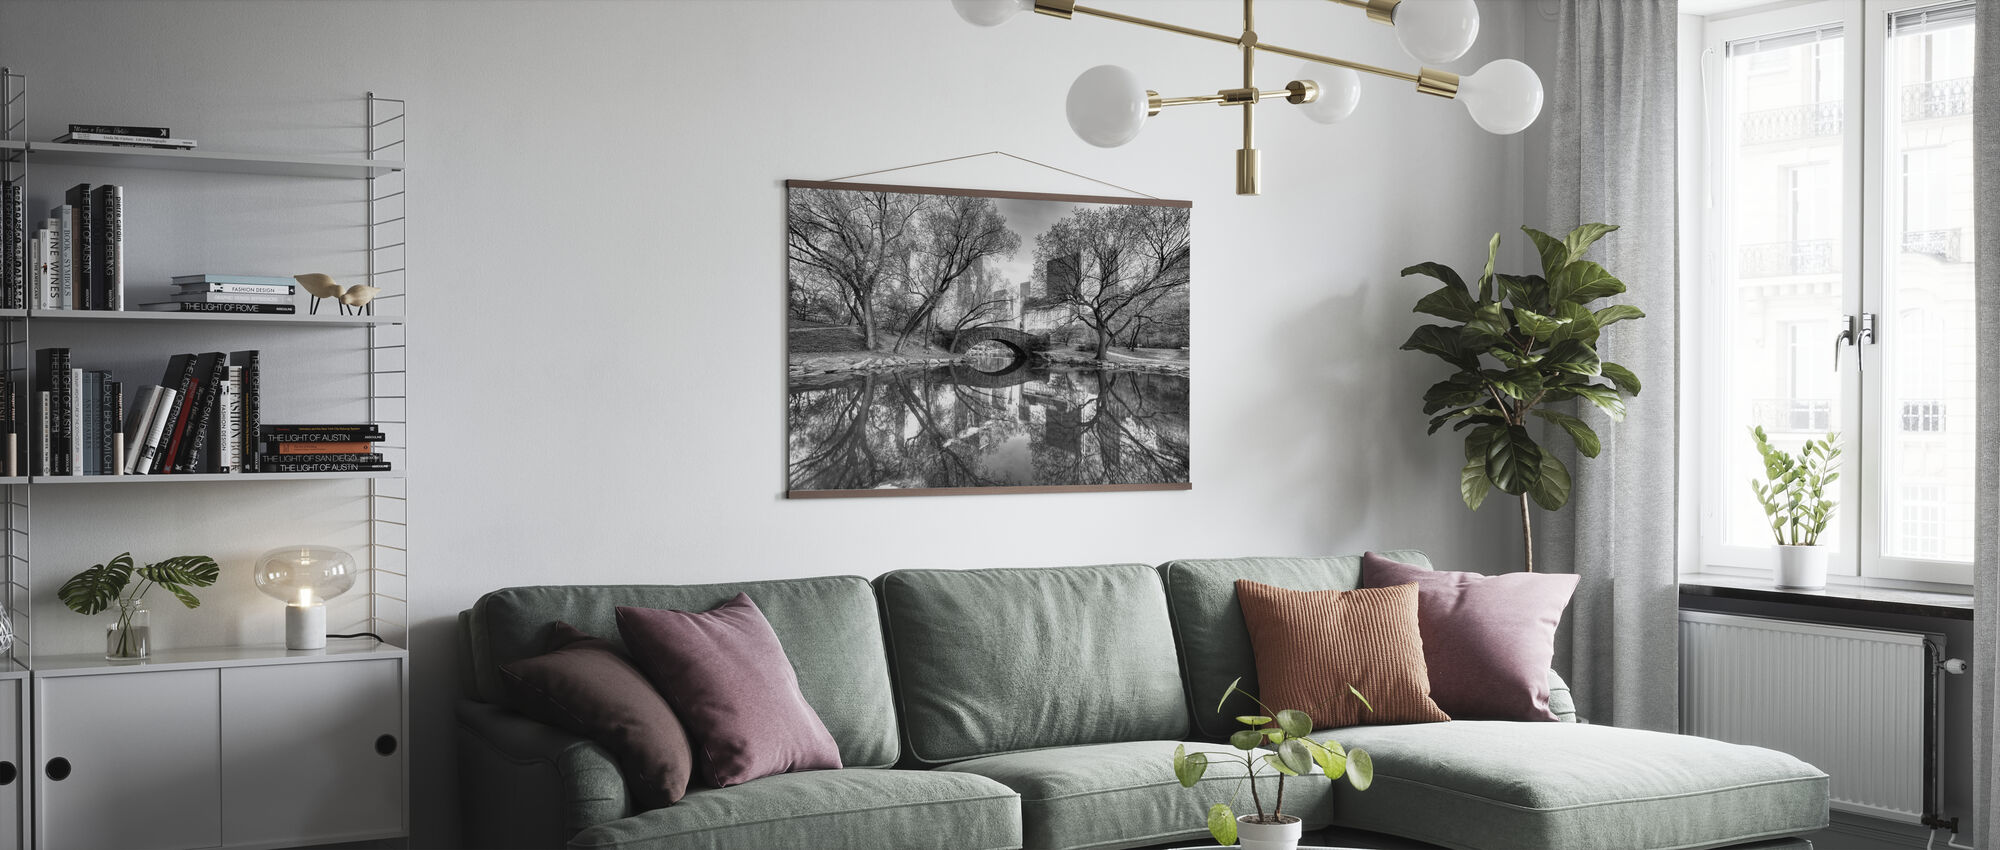 Bridge in Central Park - Poster - Living Room